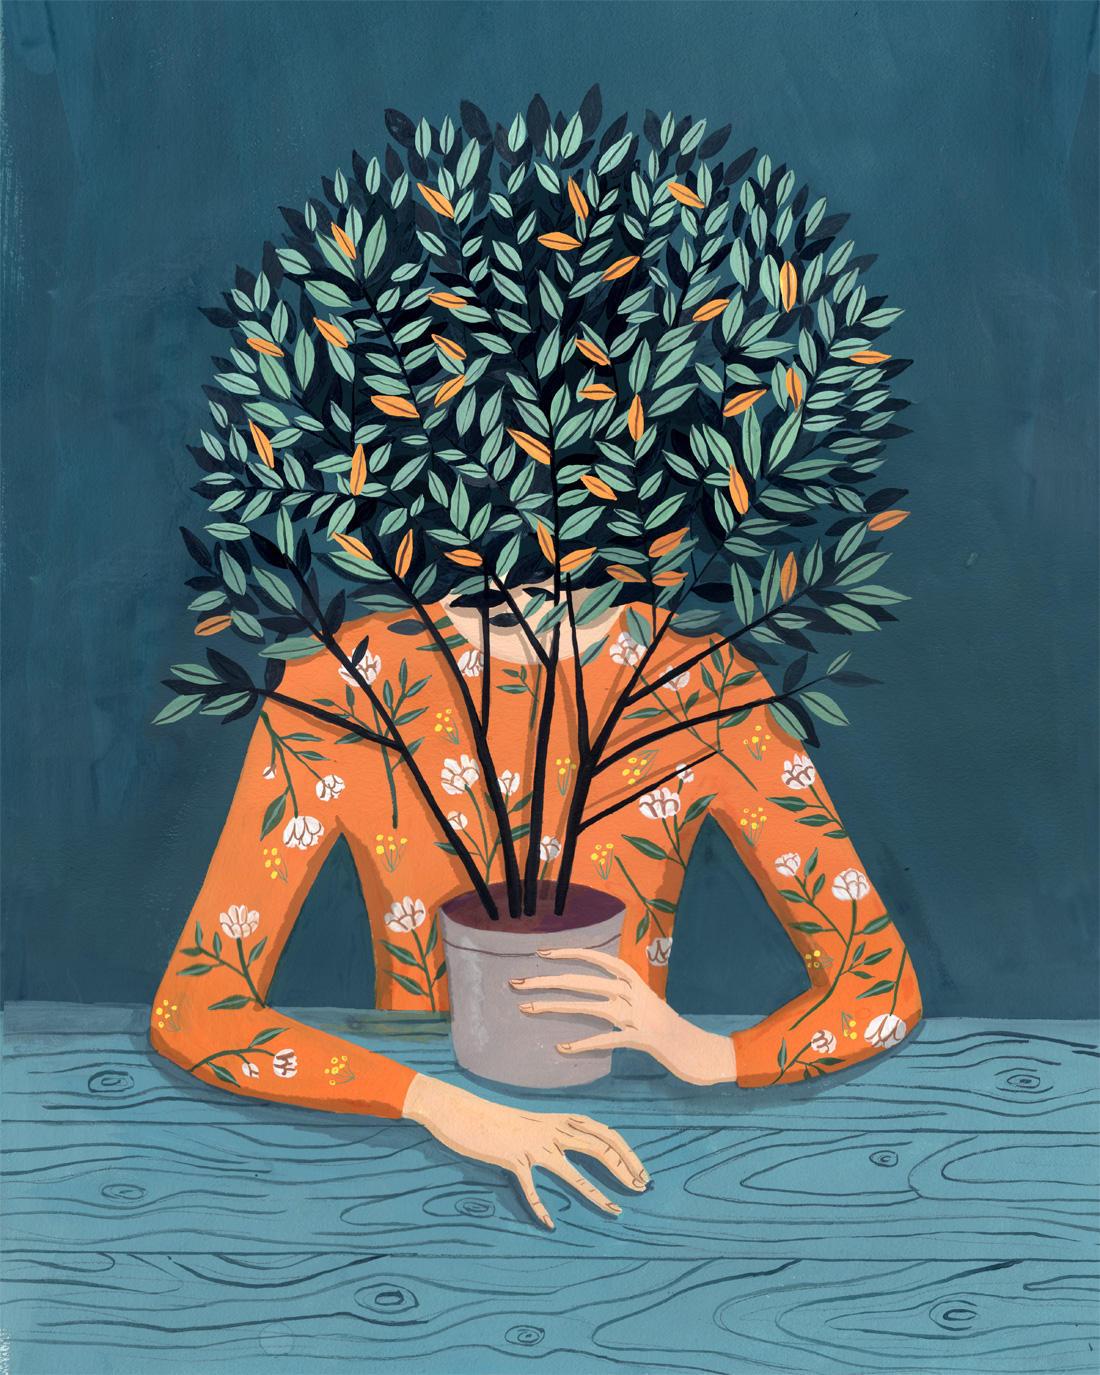 helena-perez-garcia-illustration-8